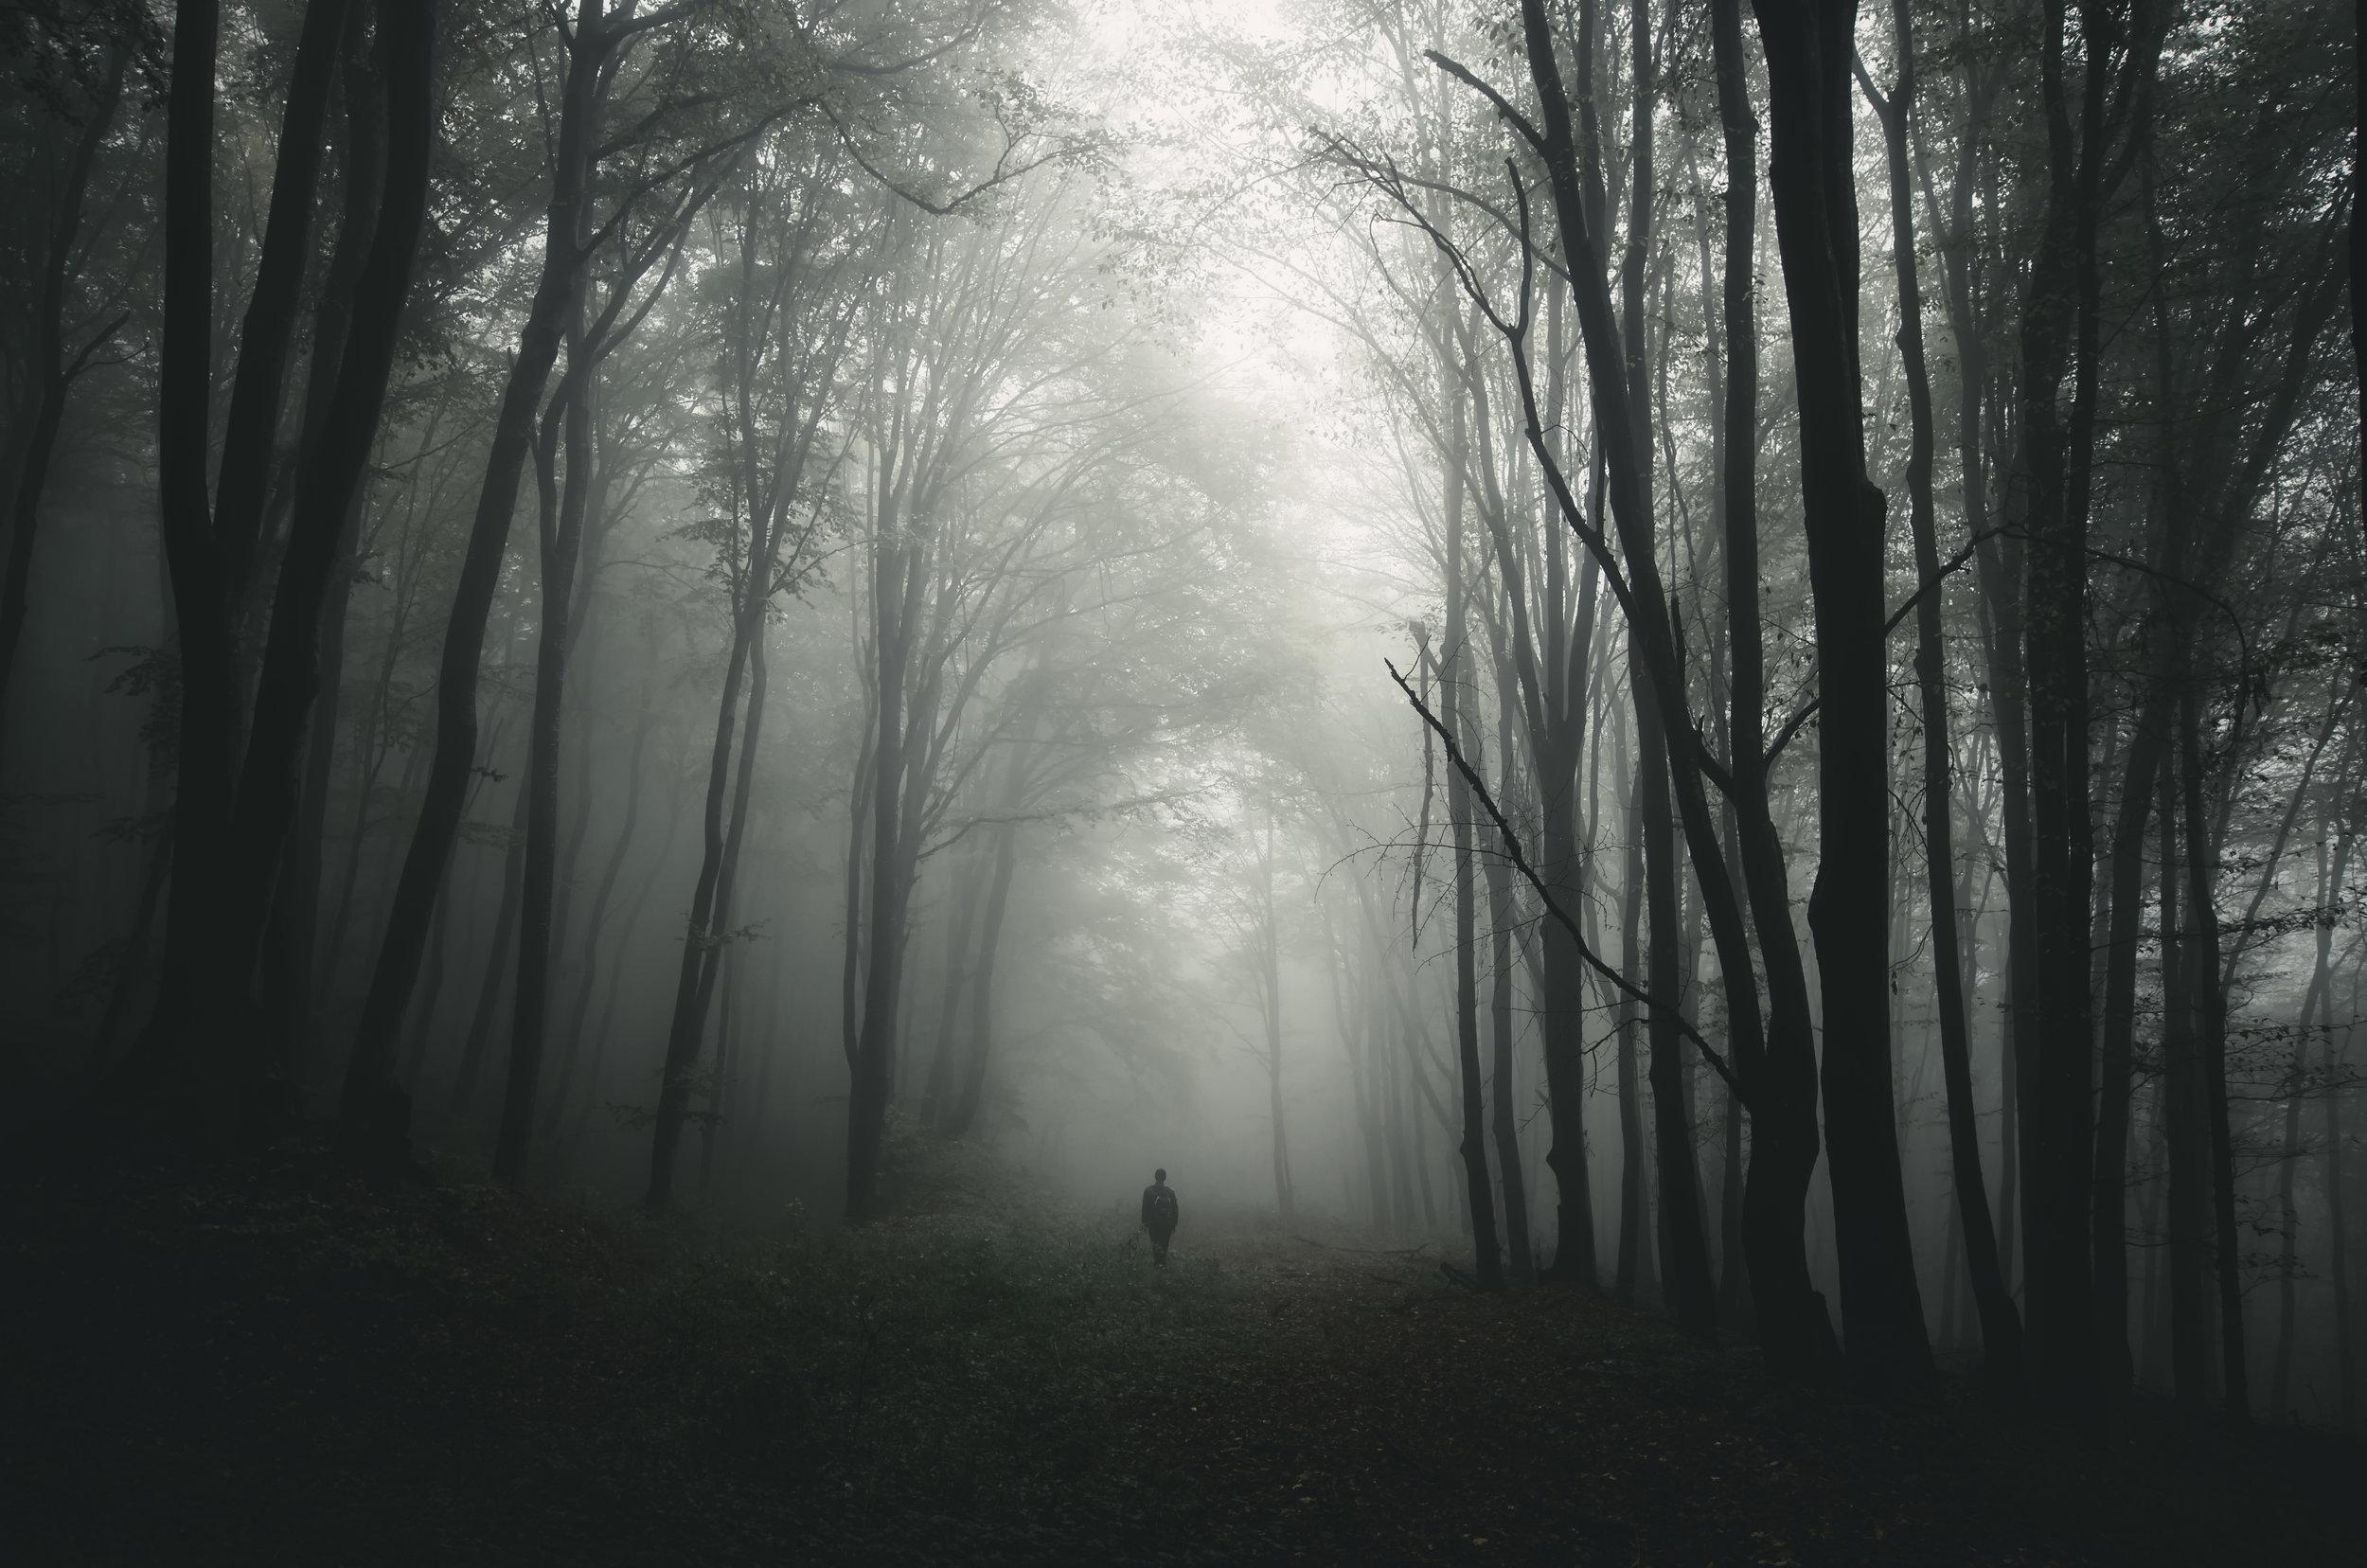 man-silhouette-in-haunted-forest-K83C75N.jpg